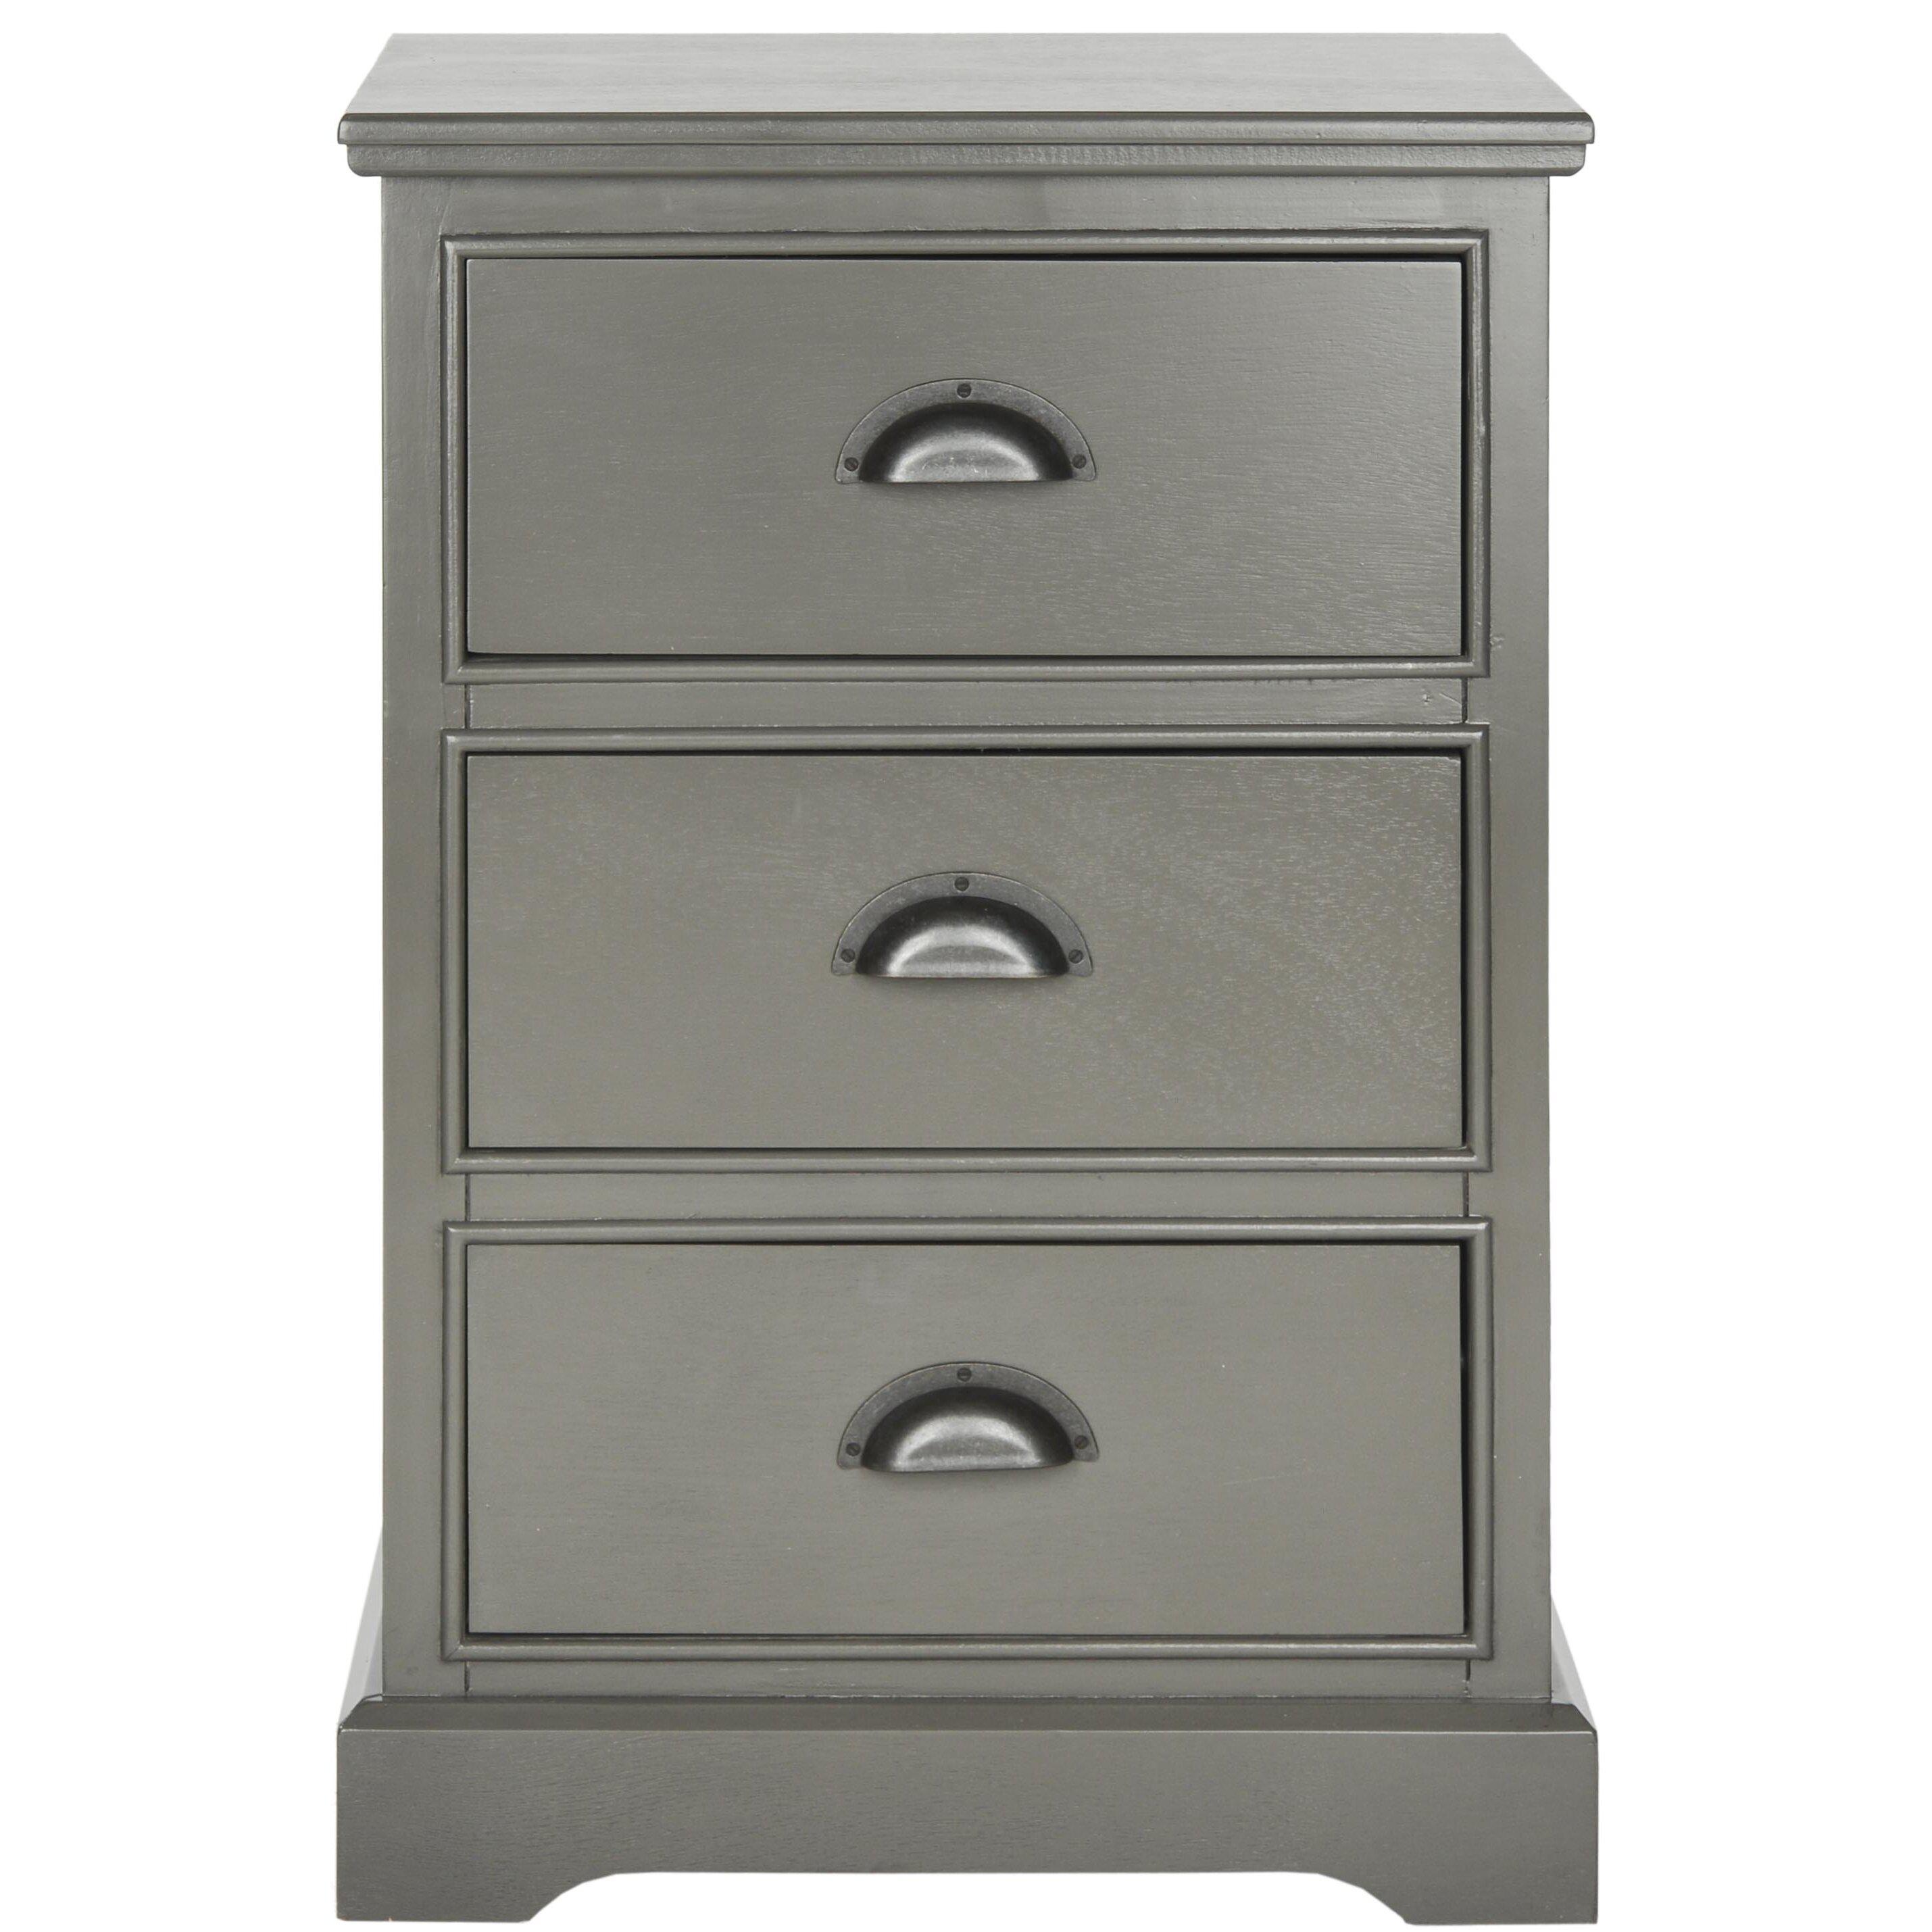 alcott hill 3 drawer end table reviews wayfair. Black Bedroom Furniture Sets. Home Design Ideas